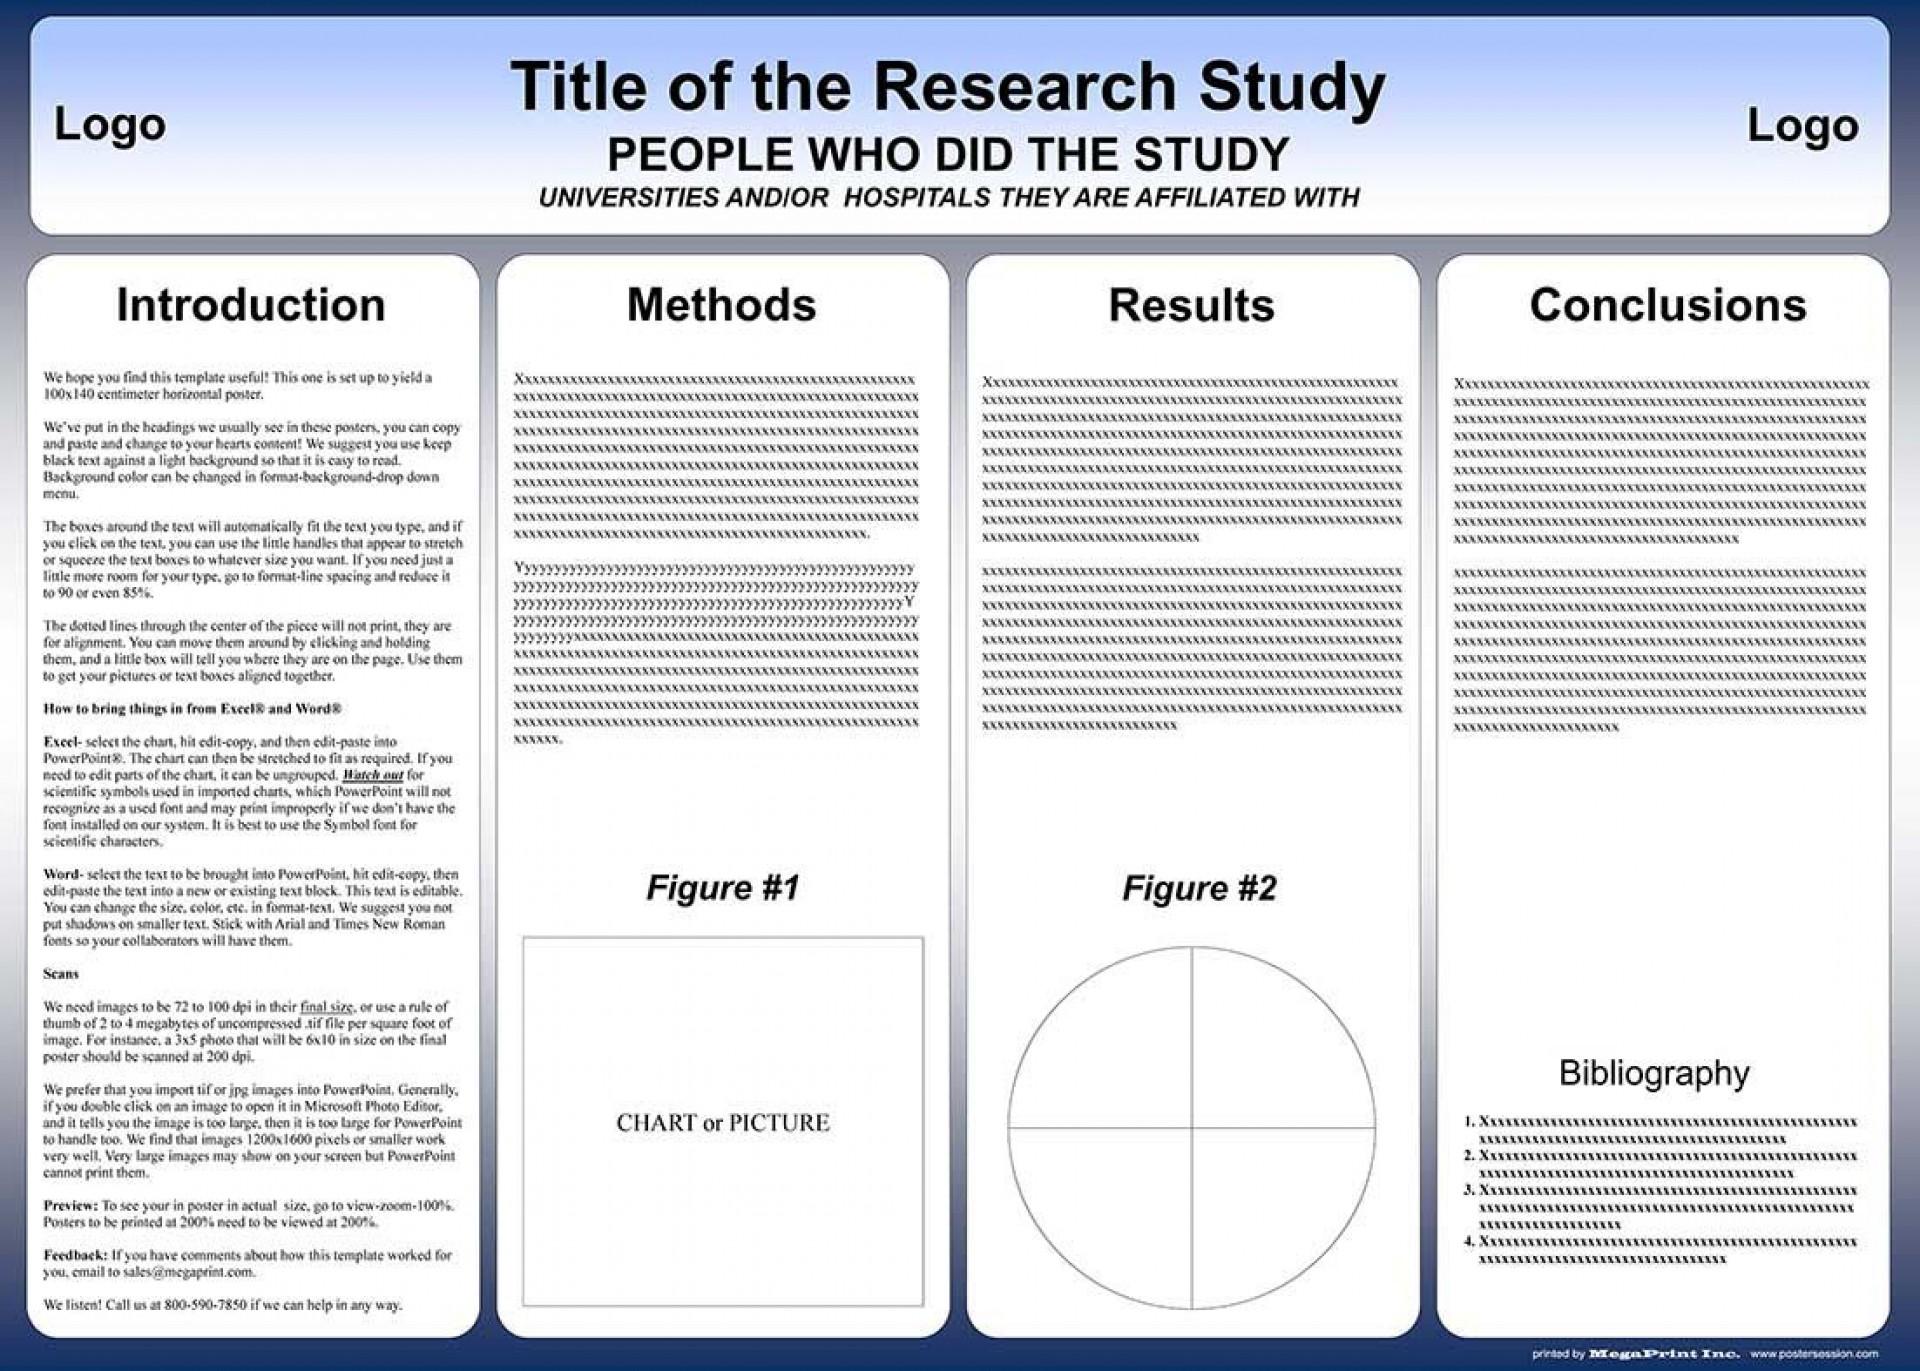 004 Surprising Scientific Poster Design Template Free Download Example 1920